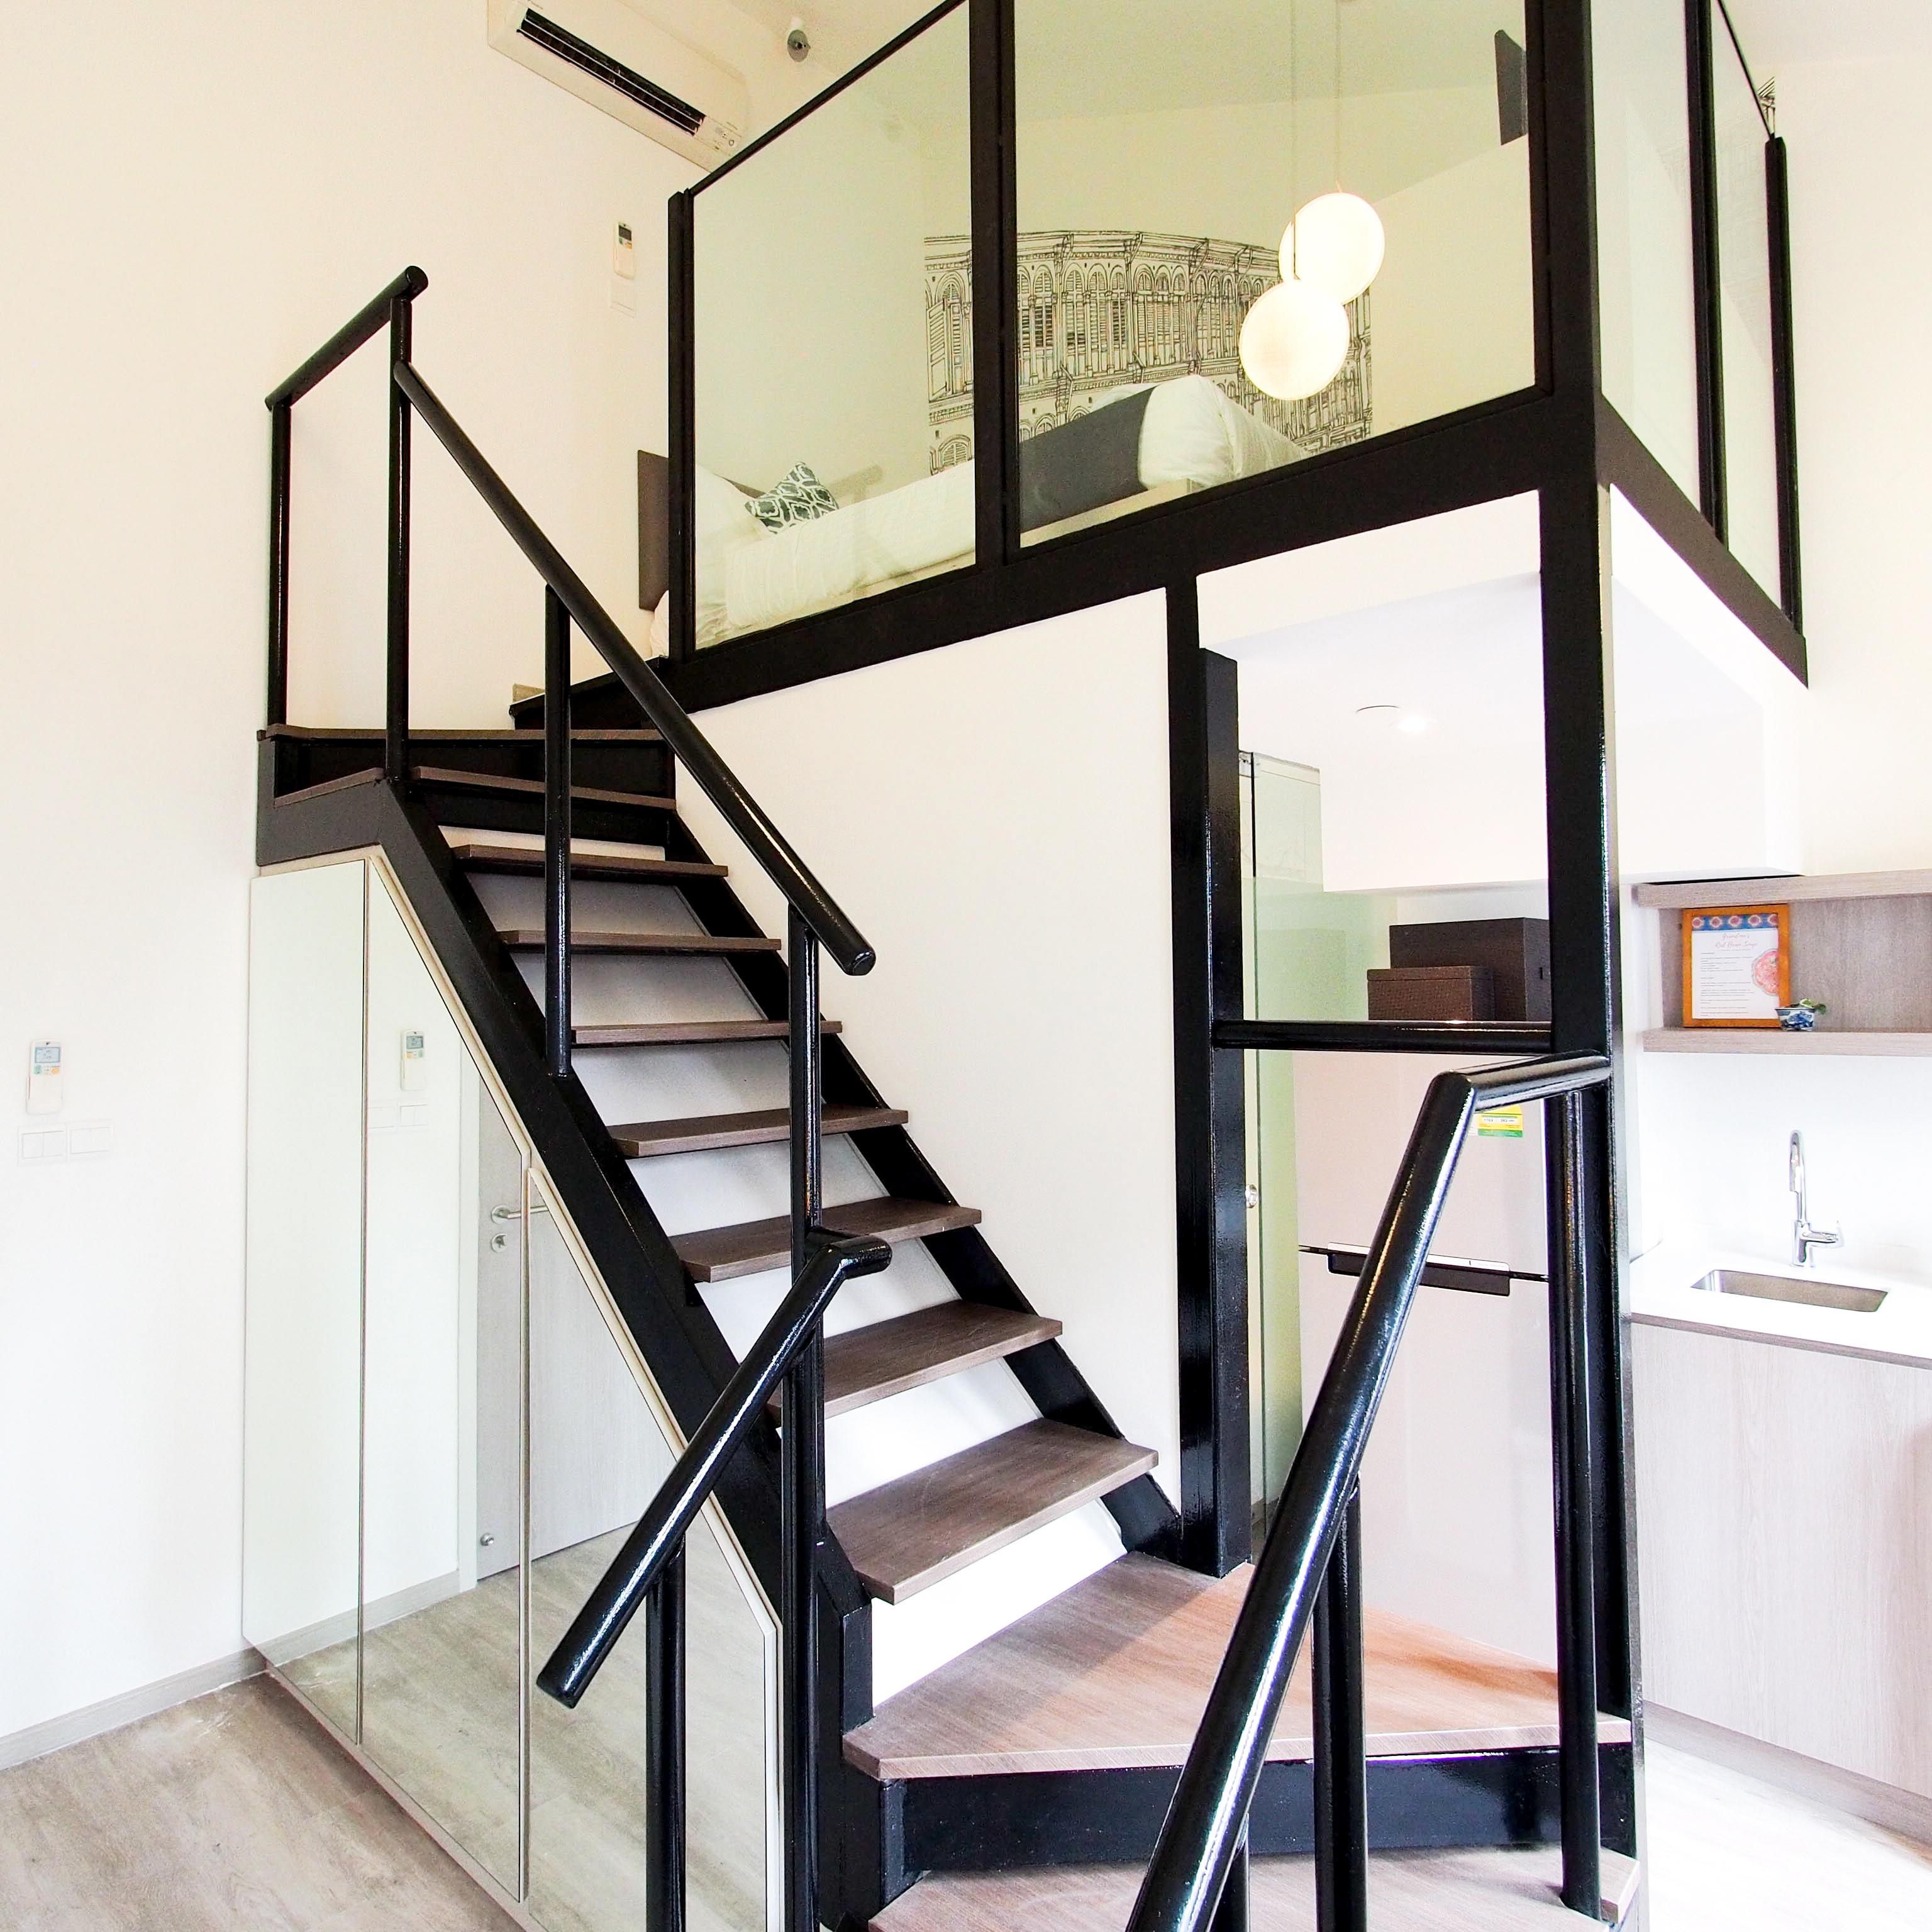 Premium Loft Apartment 3D2N Staycation Package